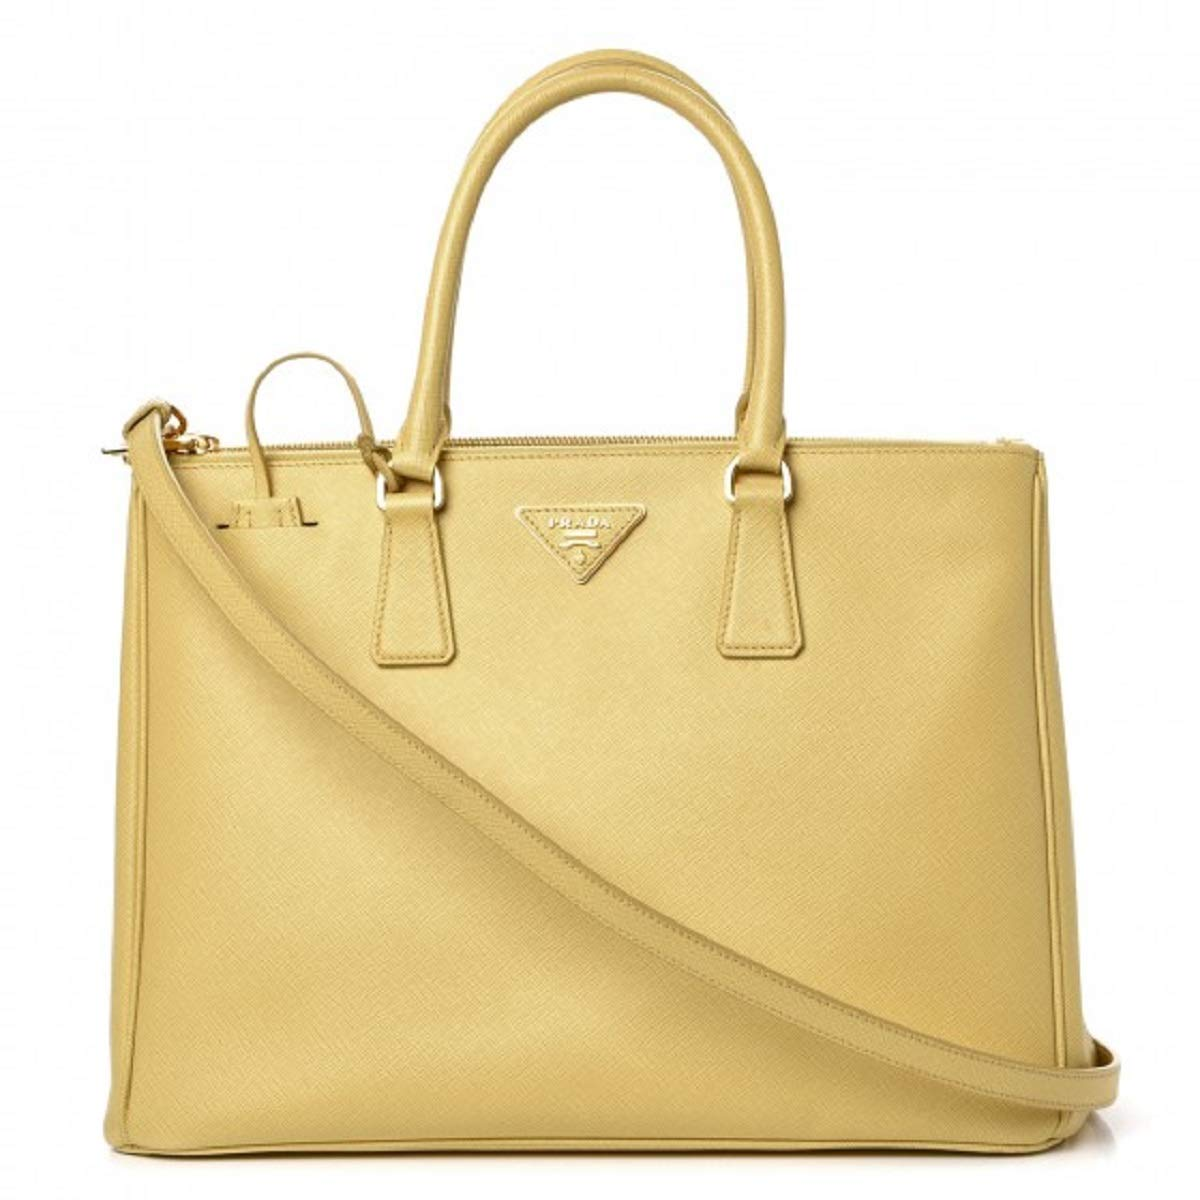 2719a8ca838d PRADA Saffiano Leather Large Galleria Double Zip Tote Polline Handbag Tote  B1786T: Amazon.ca: Shoes & Handbags